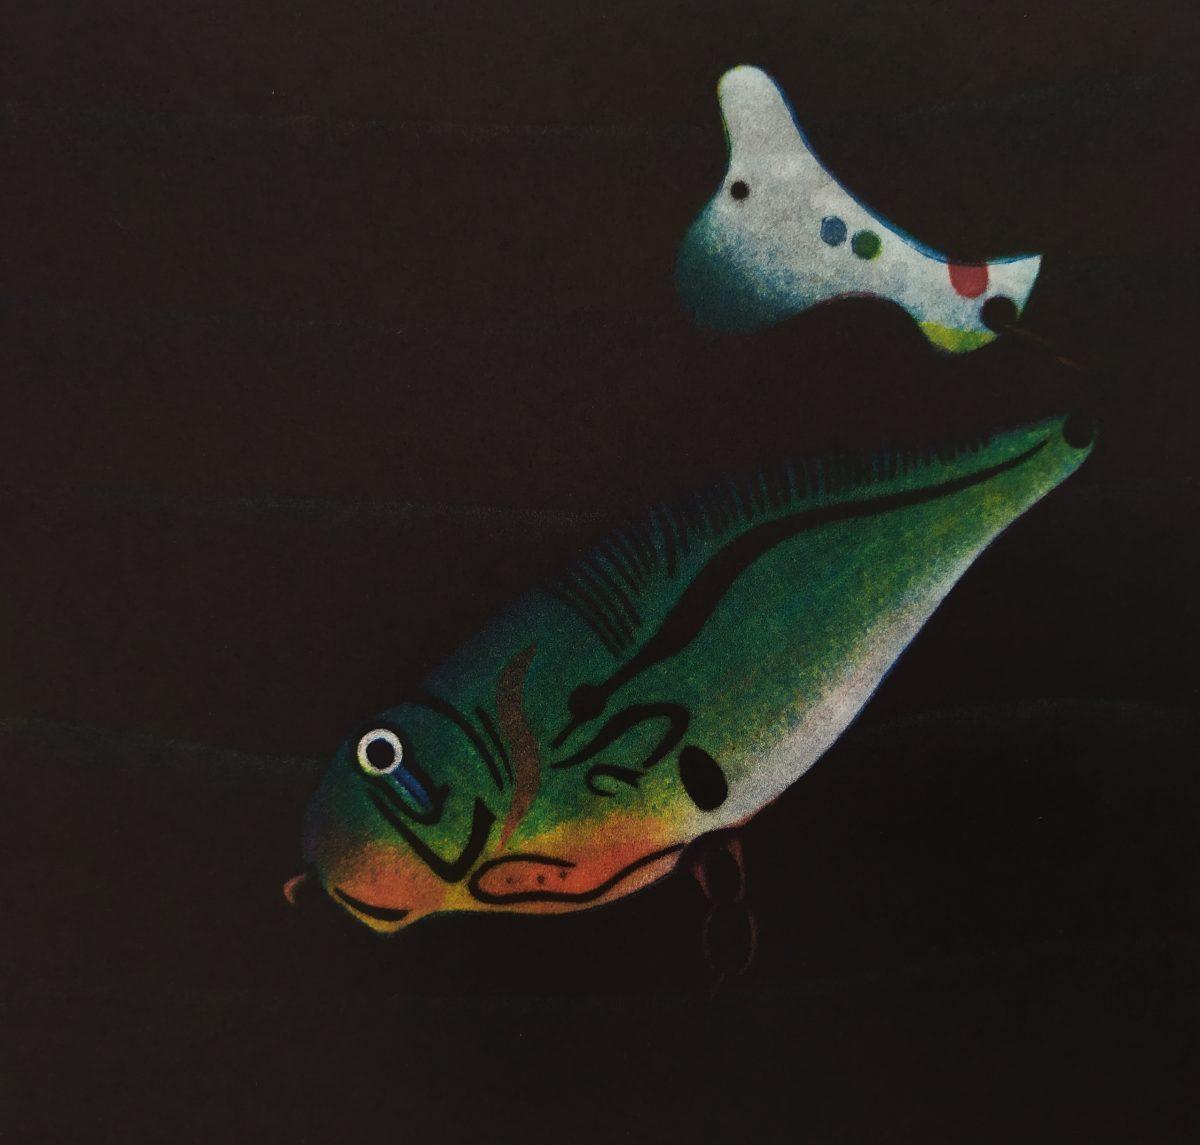 James McCreary, The lure of Miro